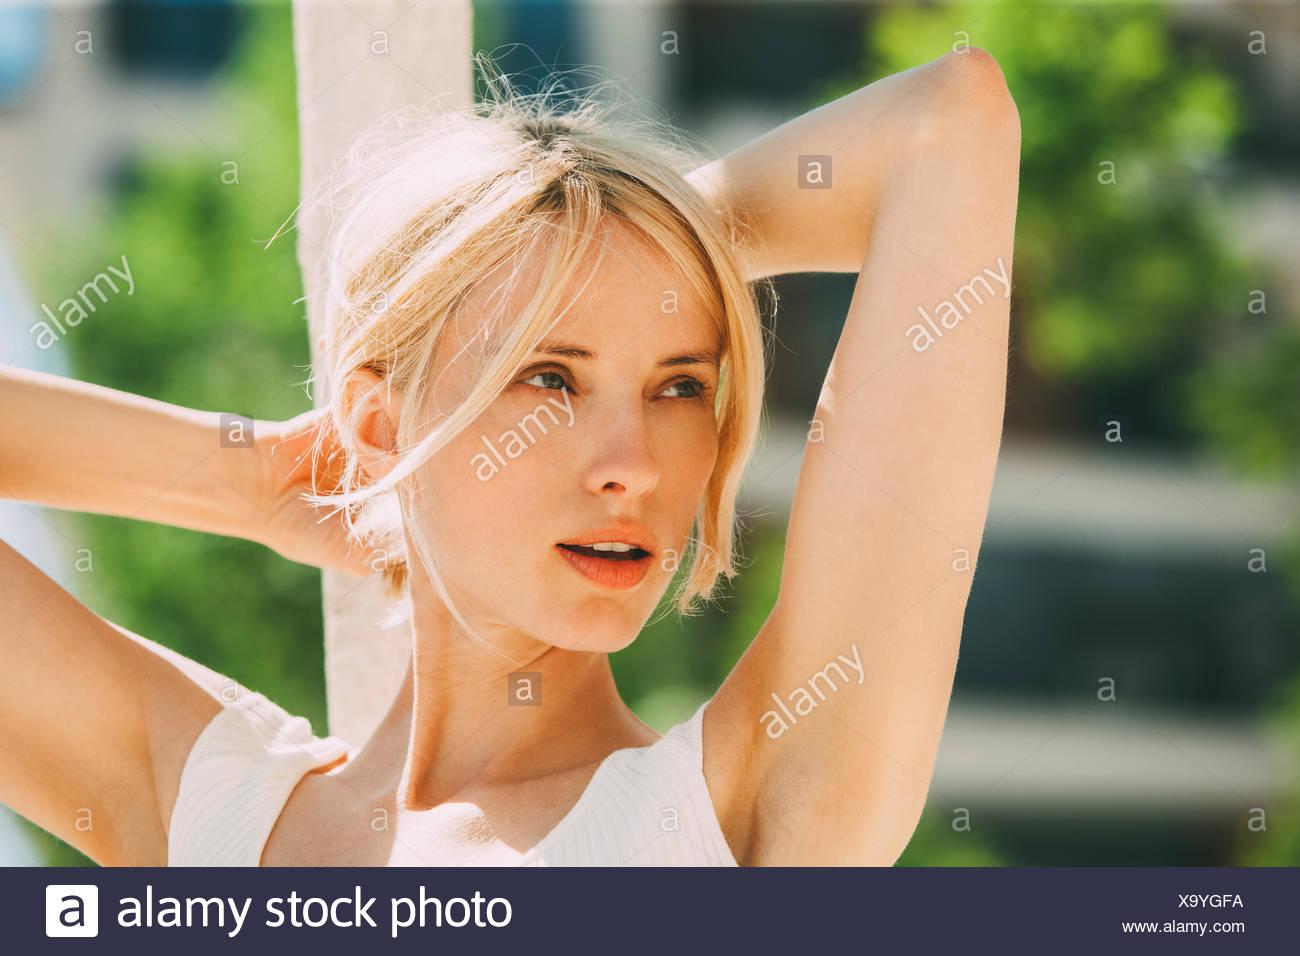 Portrait of blond woman - Stock Image